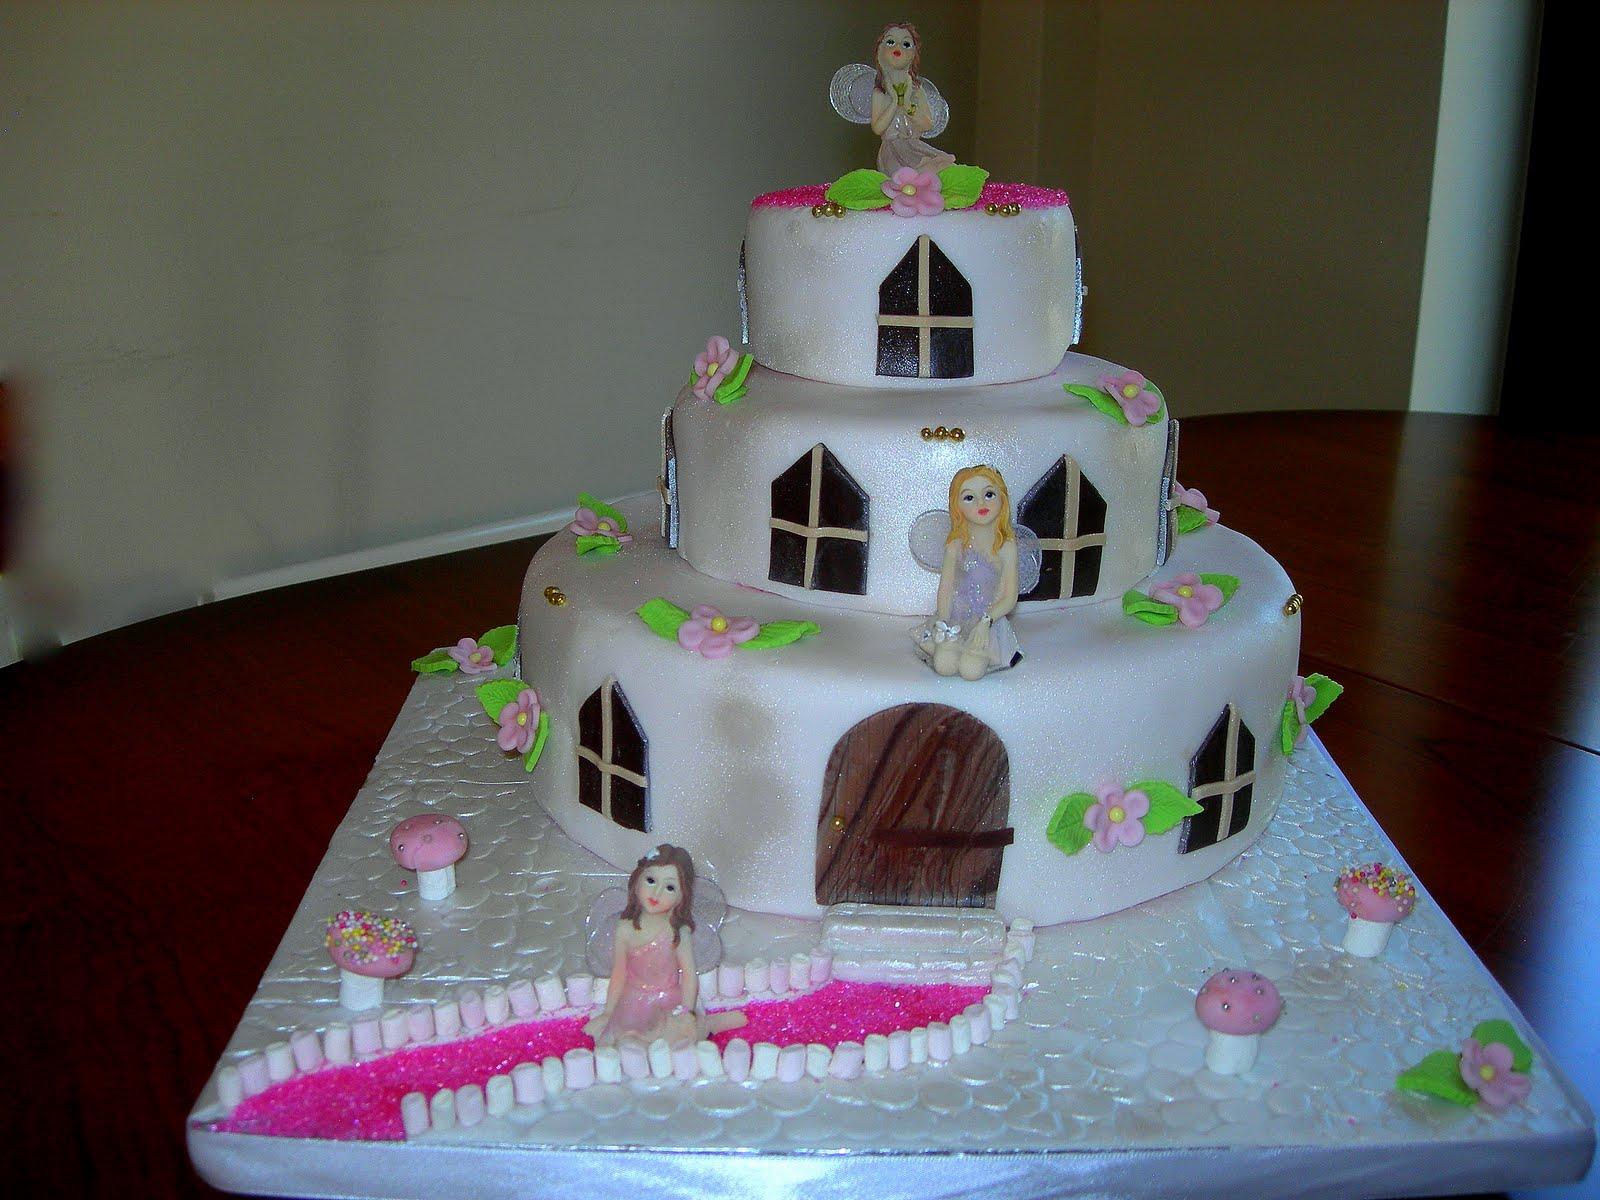 Cake With House Design : Custom Cake Design: The Fairy House